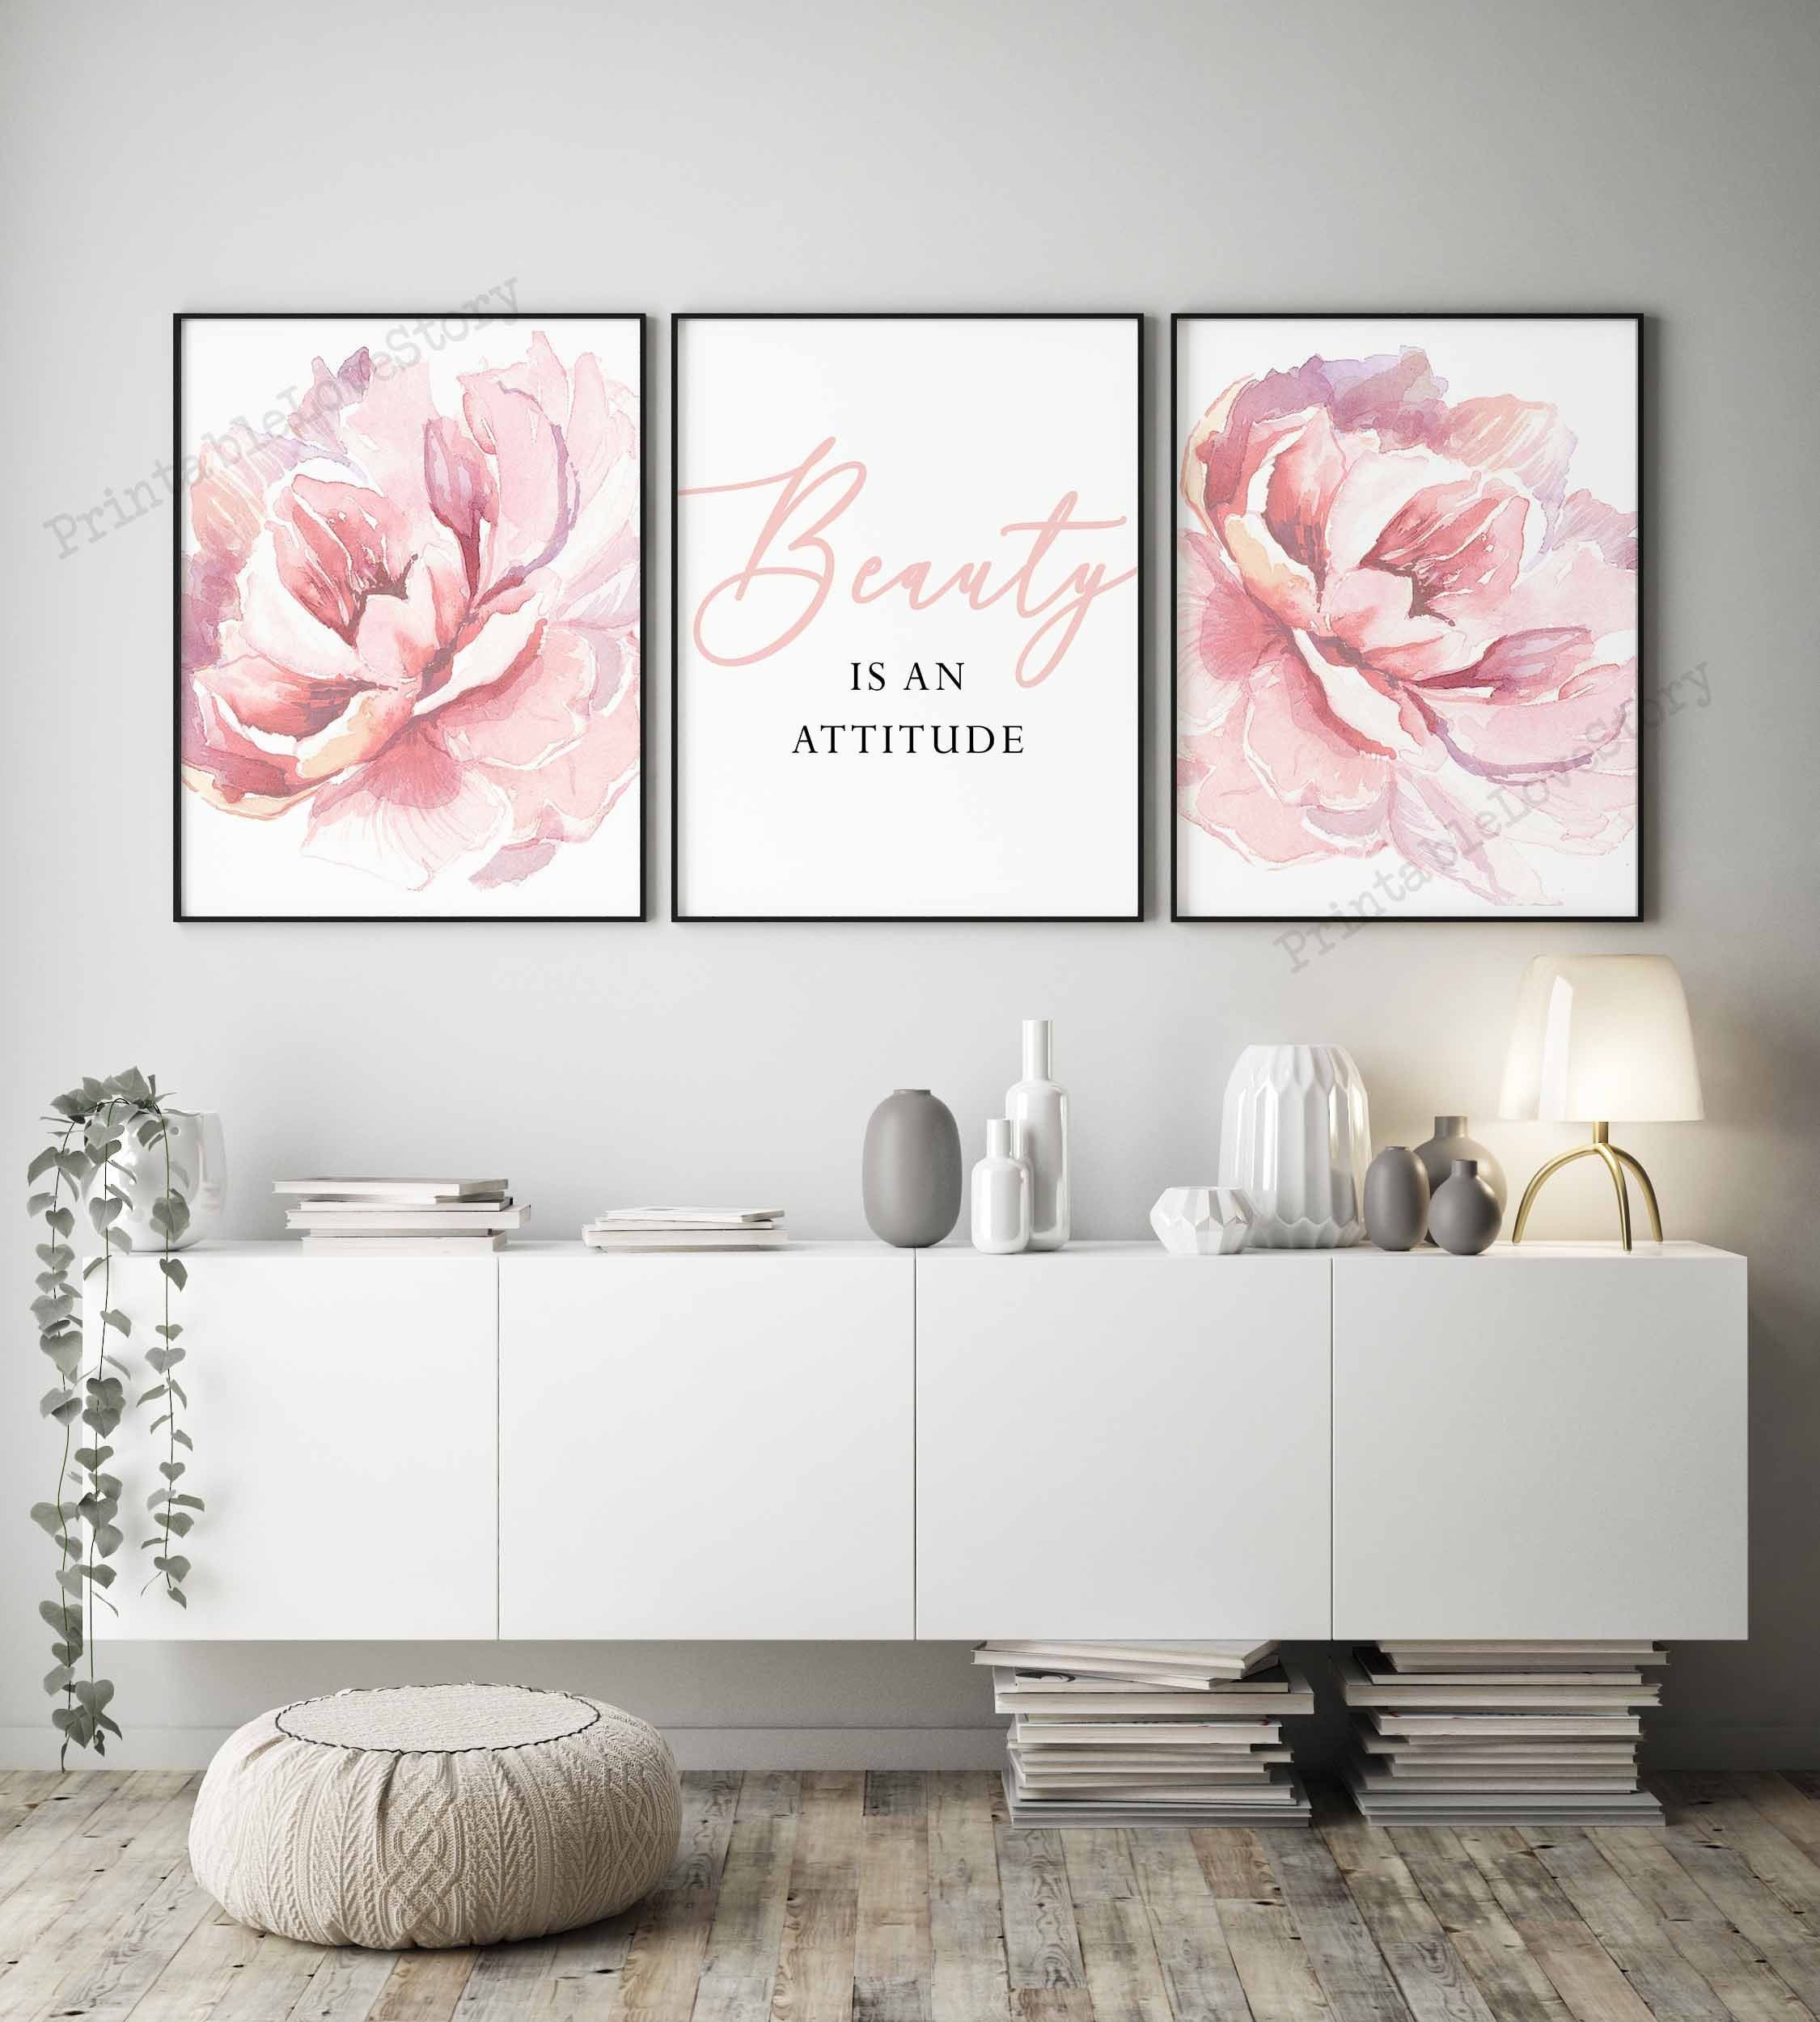 Blush Pink Wall Artbeauty Quotesbedroom Wall Artfashion Etsy In 2020 Bedroom Wall Art Pink Living Room Pink Bedroom Decor